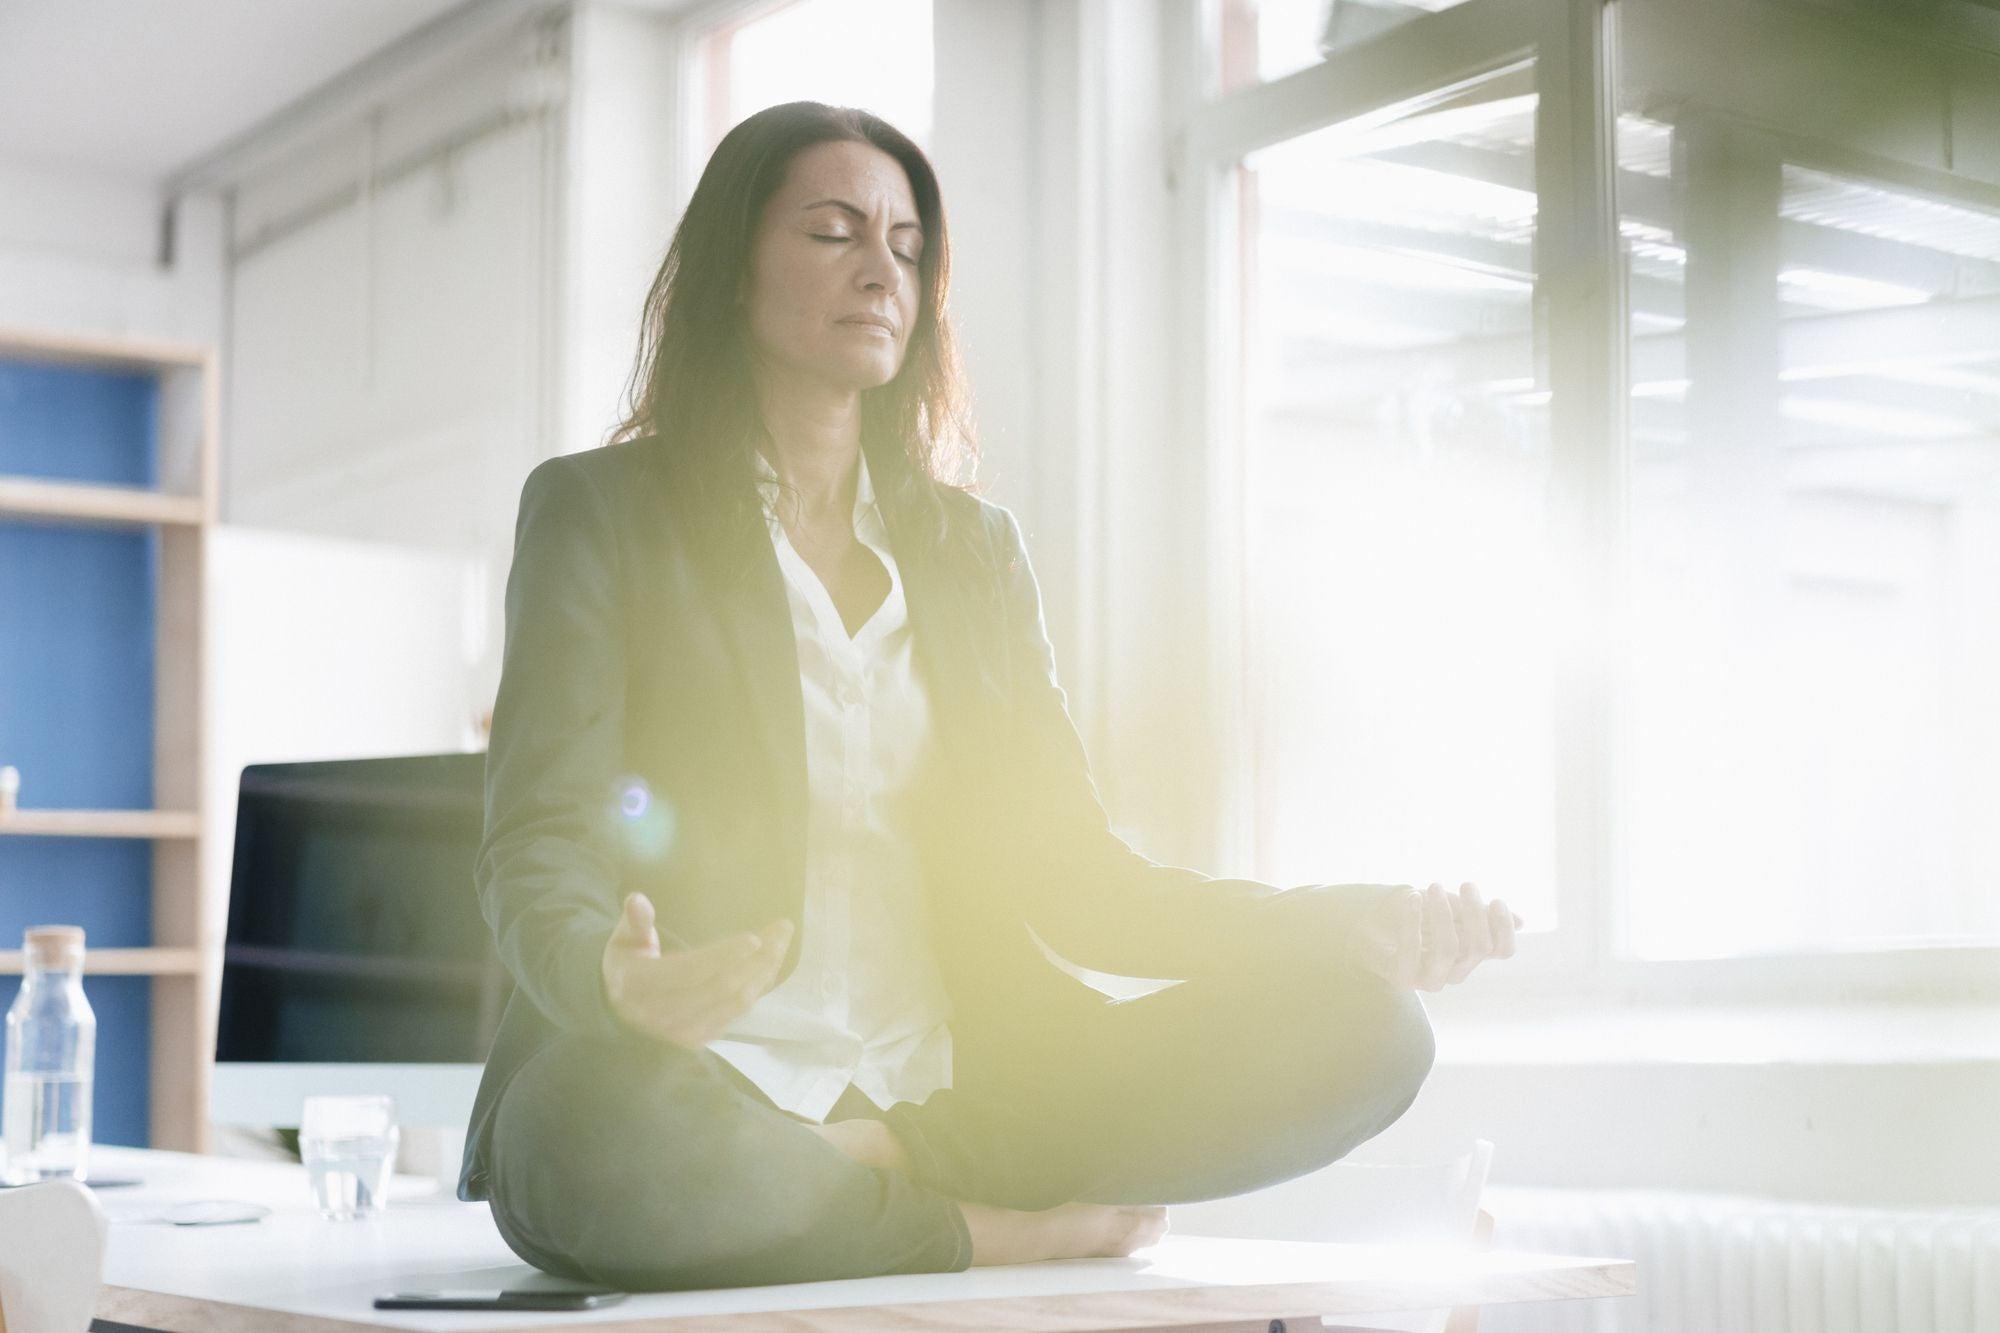 Avoiding Negative Emotions Won't Get You Anywhere